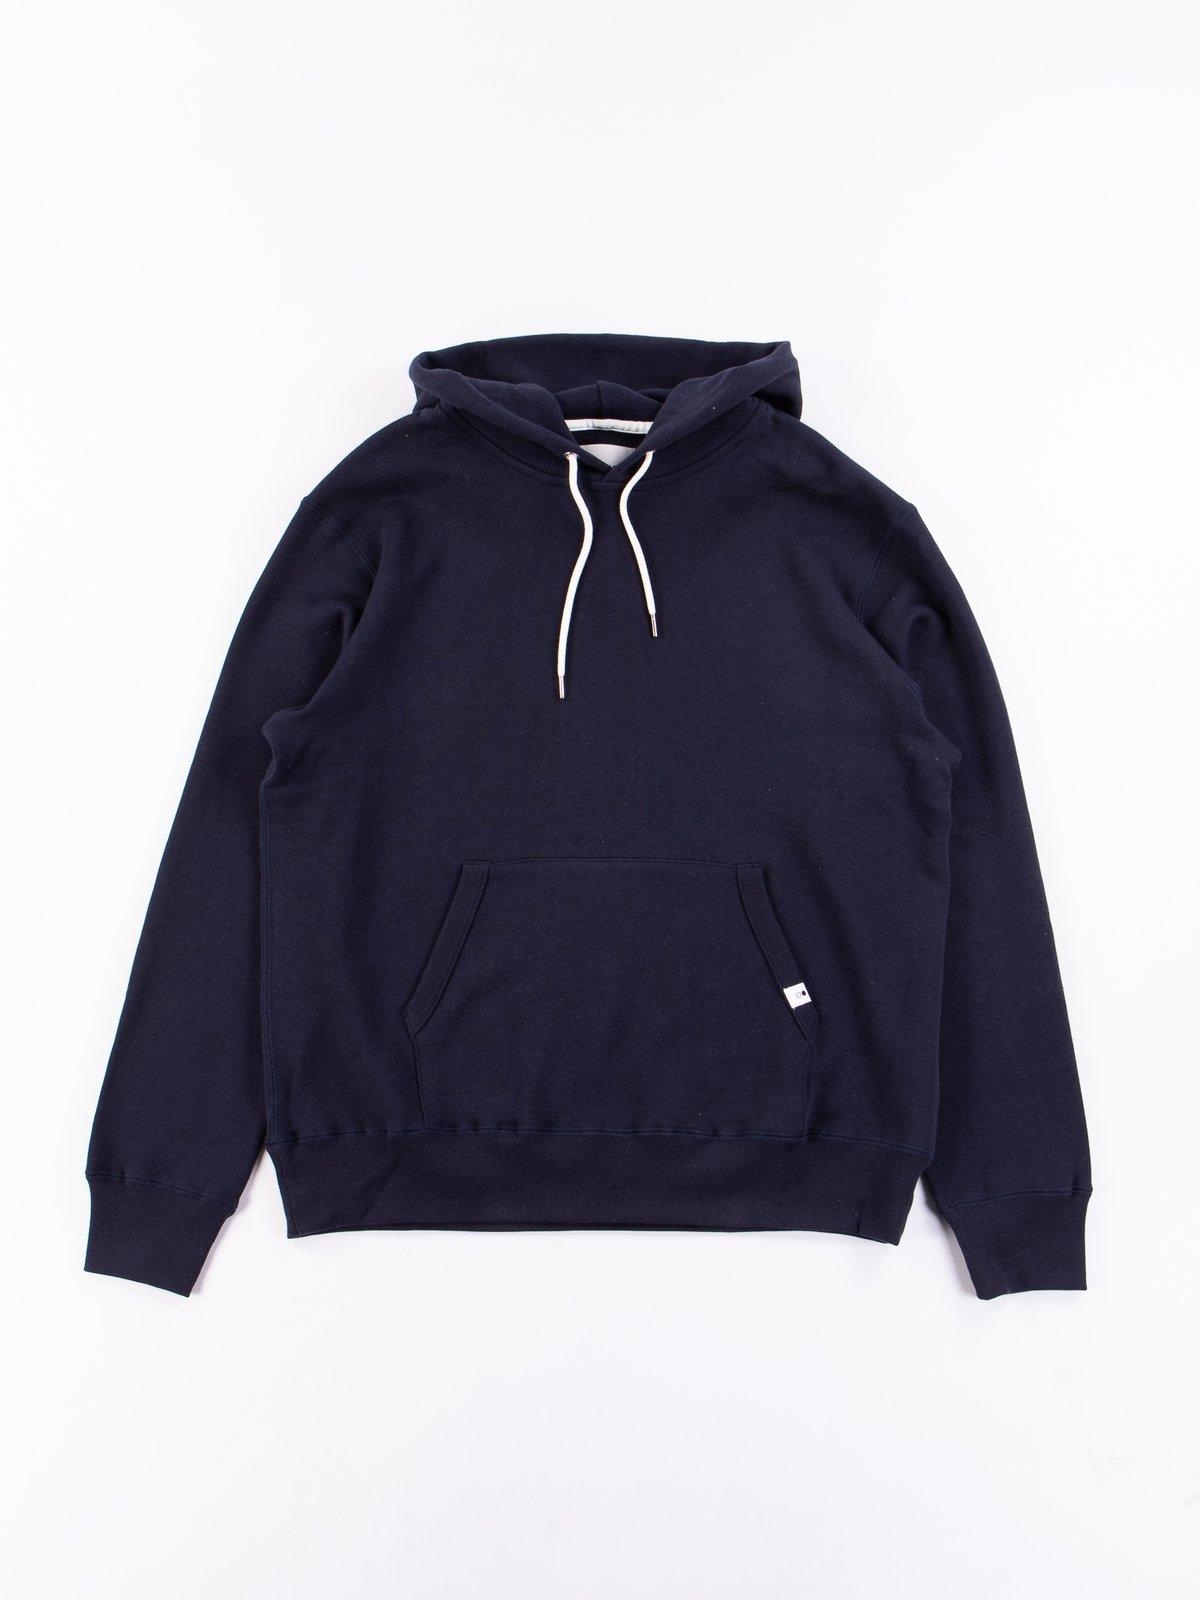 Navy Pullover Hoodie - Image 1